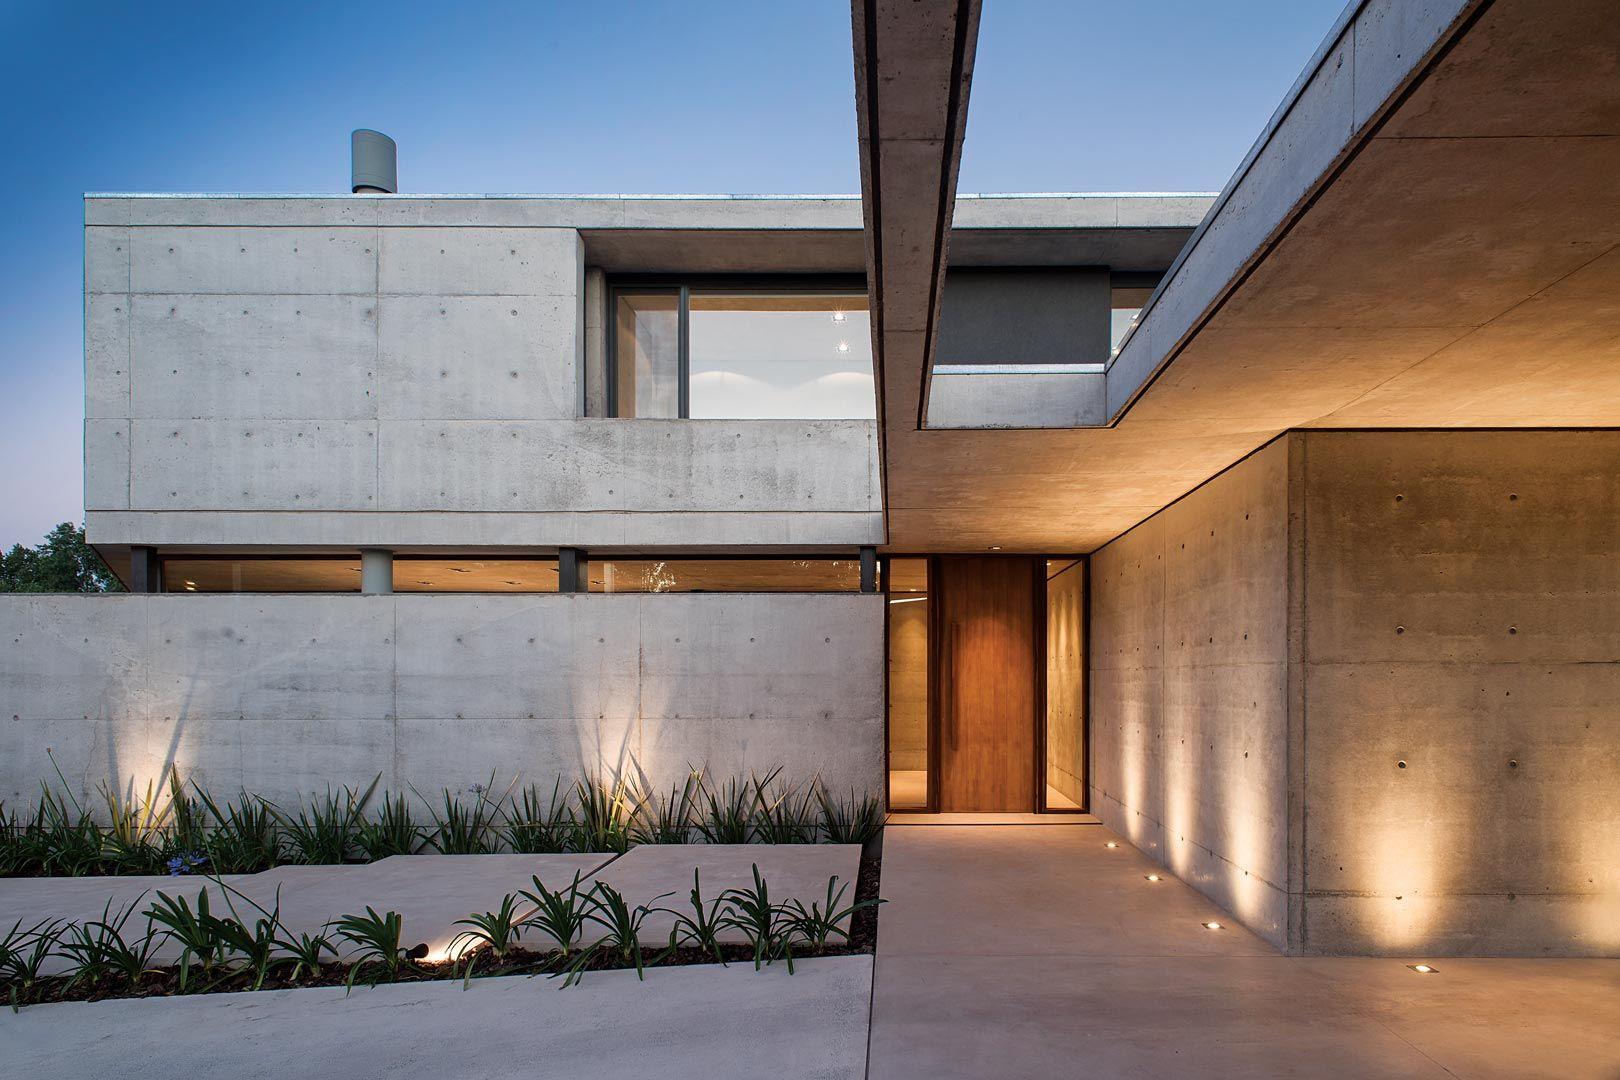 Amado cattaneo arquitectos arquitectos amar y portal de for Casas modernas hormigon visto